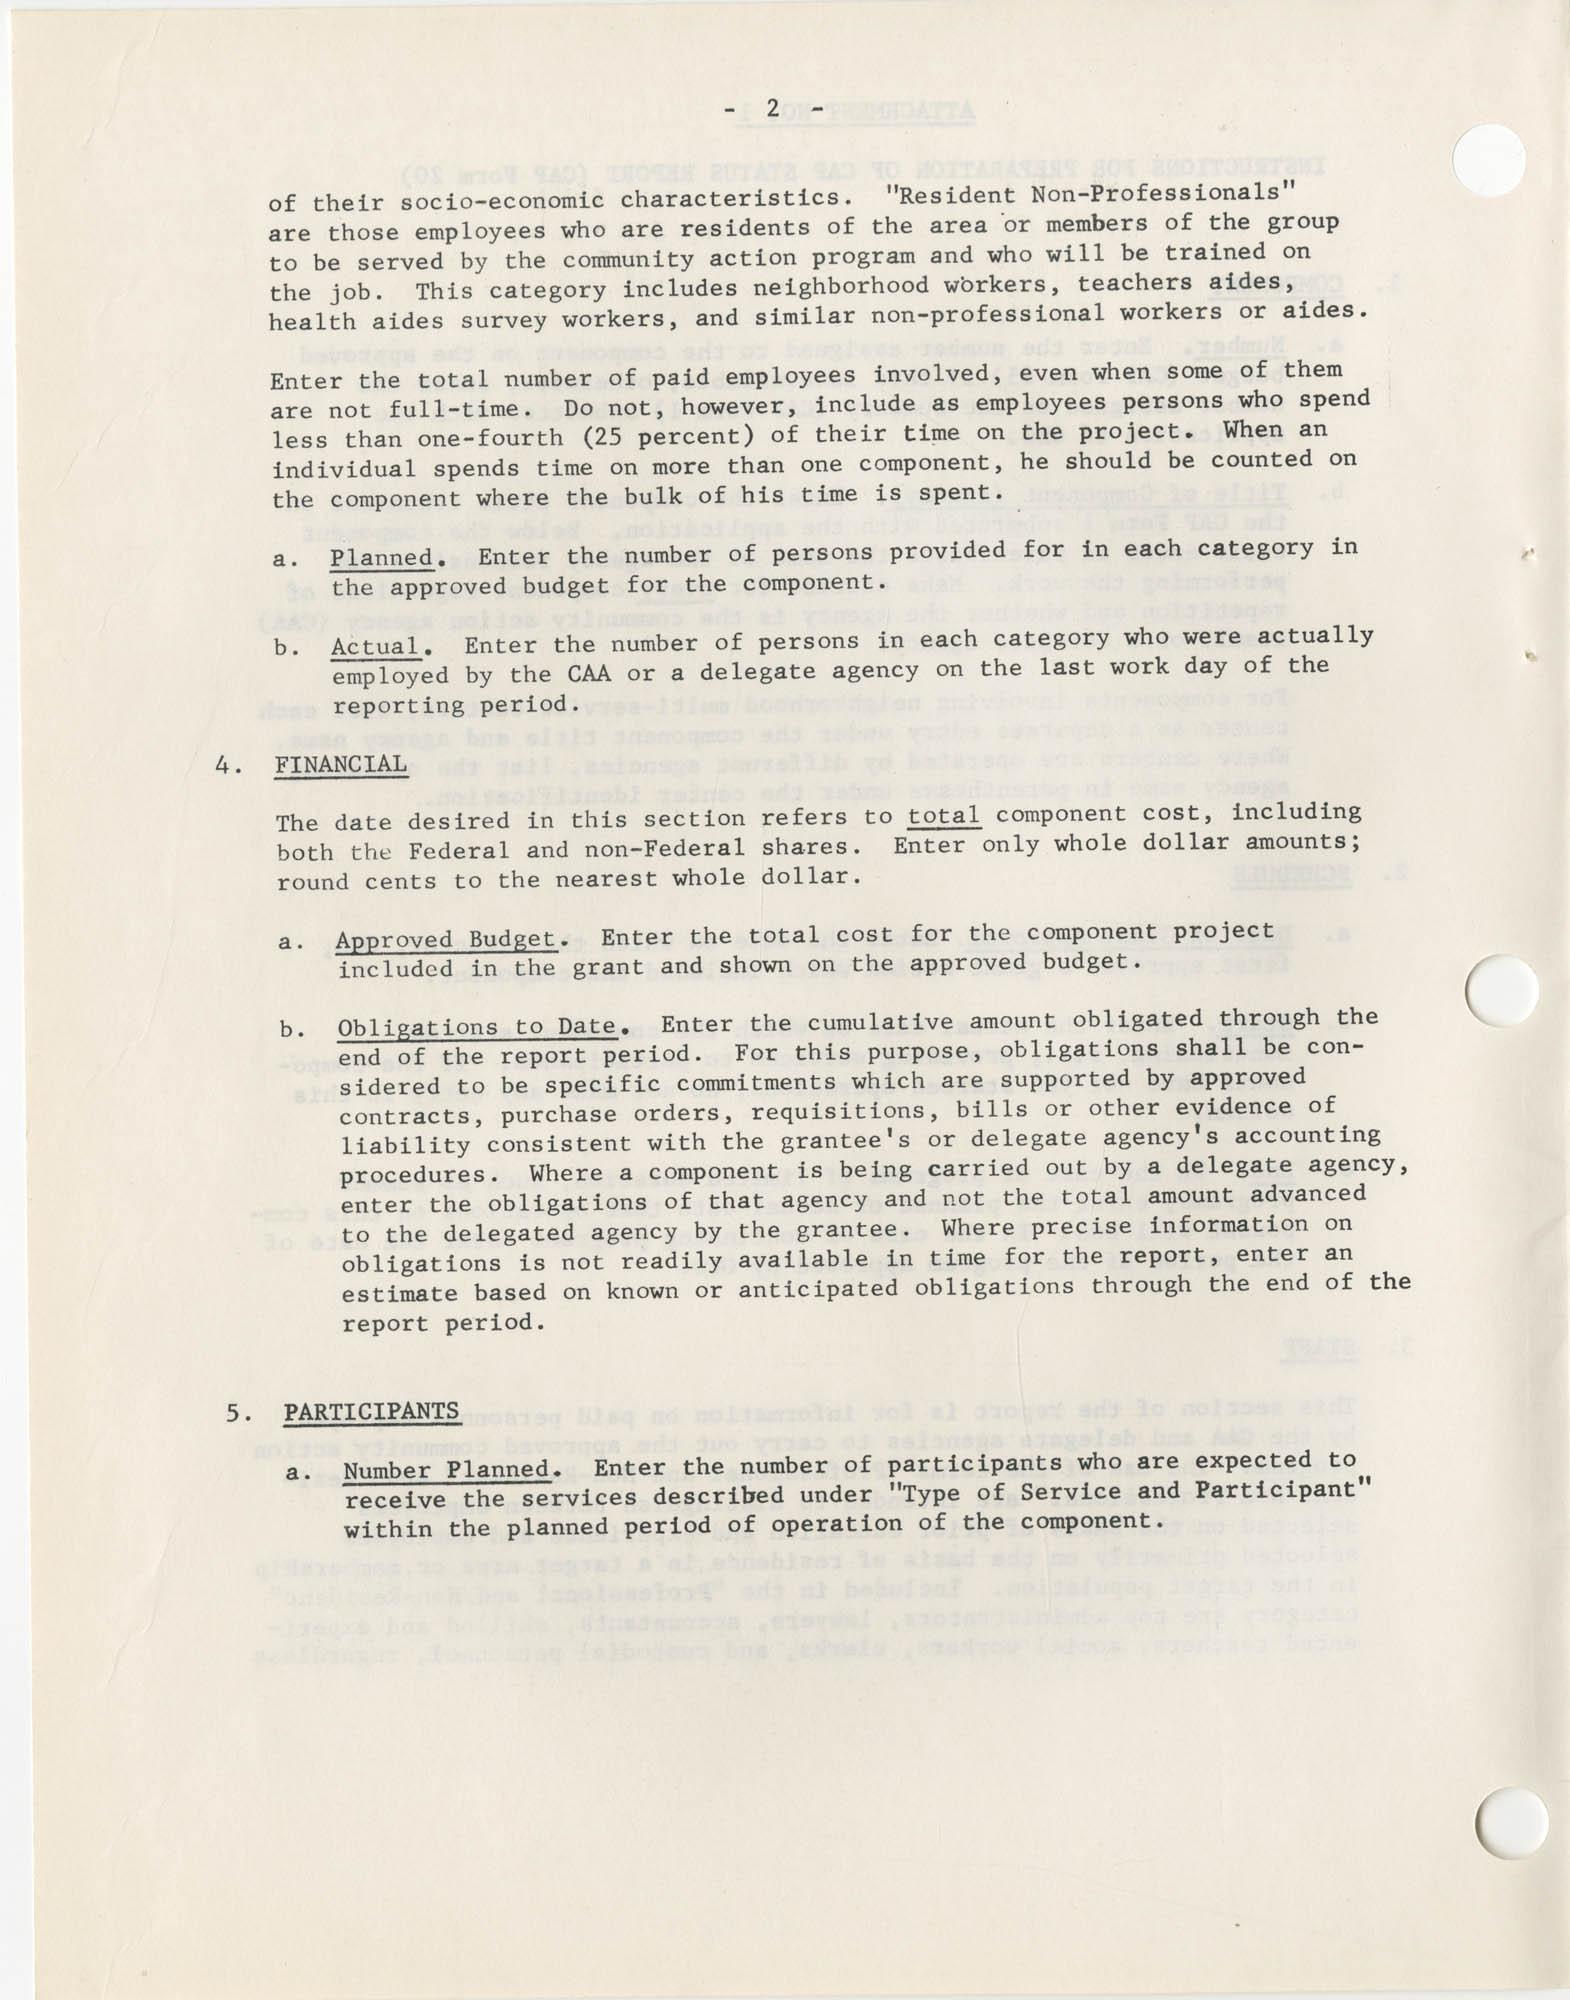 Community Action Program Memorandum No. 8, Attachment No. 1, Page 2